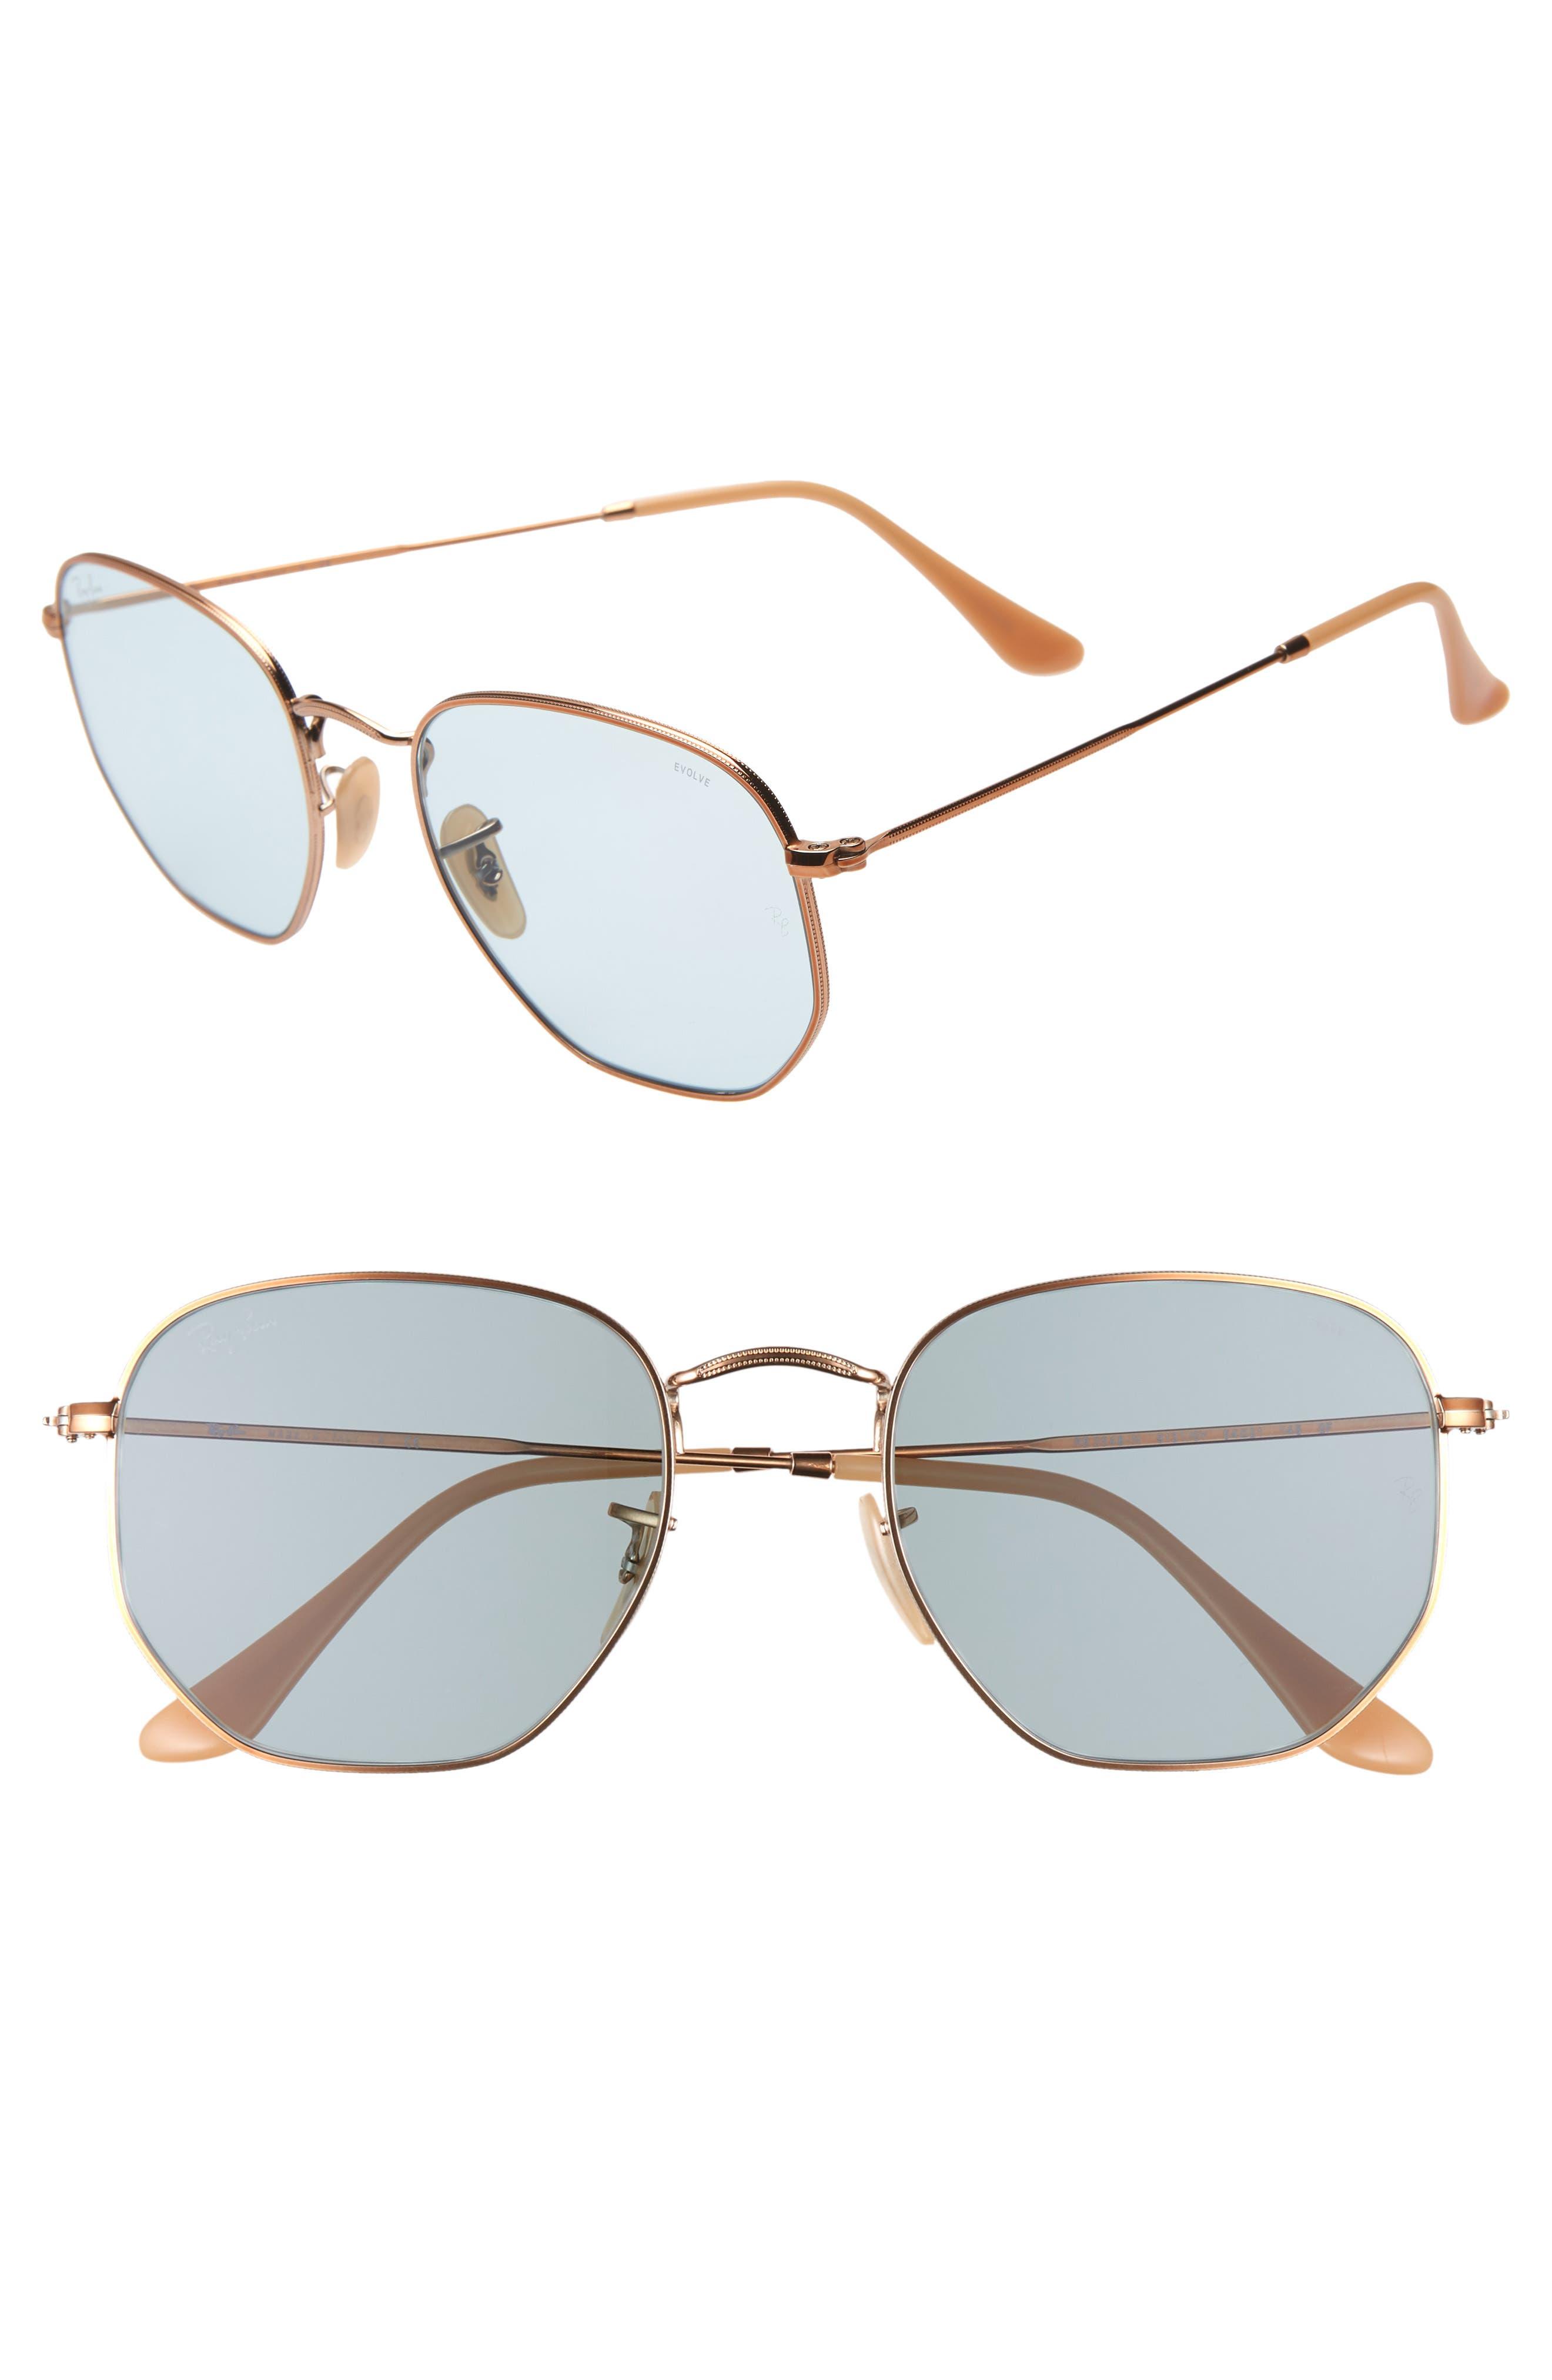 54mm Evolve Photochromic Hexagon Sunglasses, Main, color, GOLD/ LIGHT BLUE SOLID